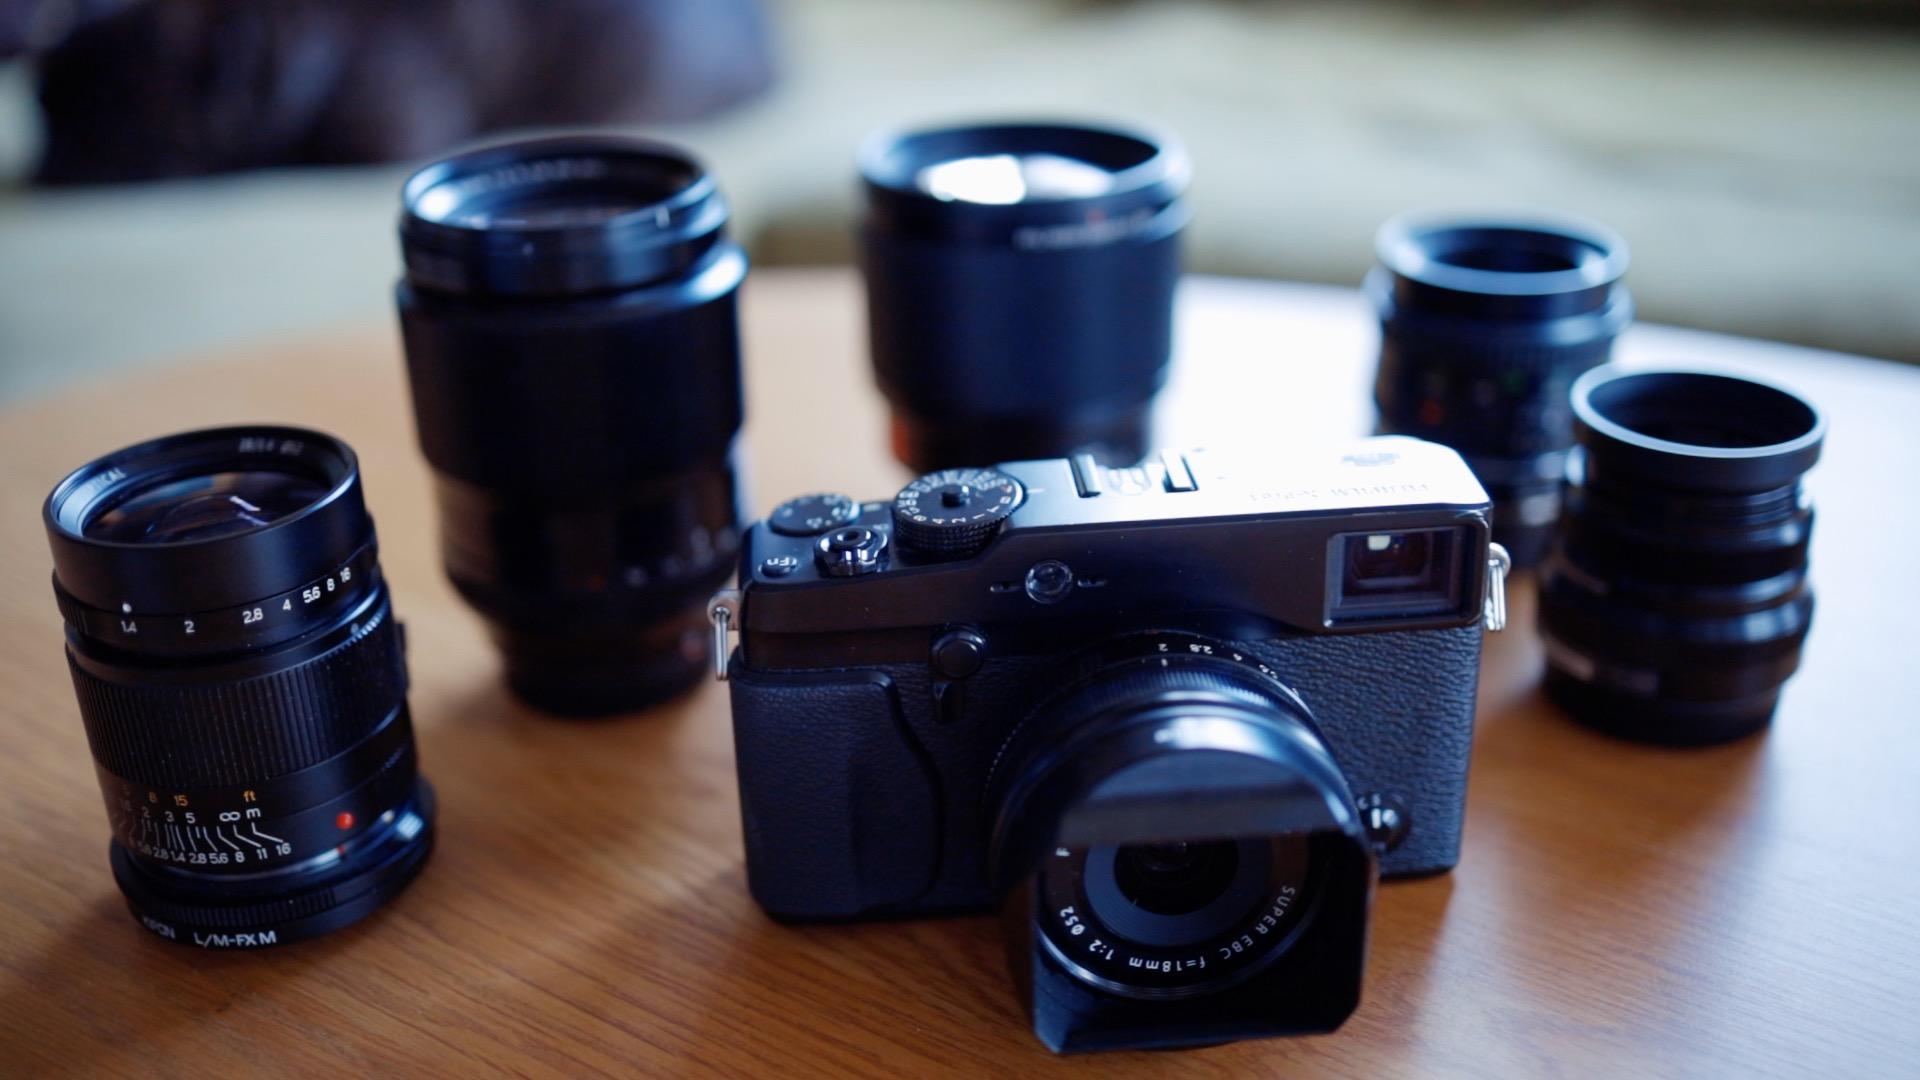 Fuji X-Pro1 Review Sample